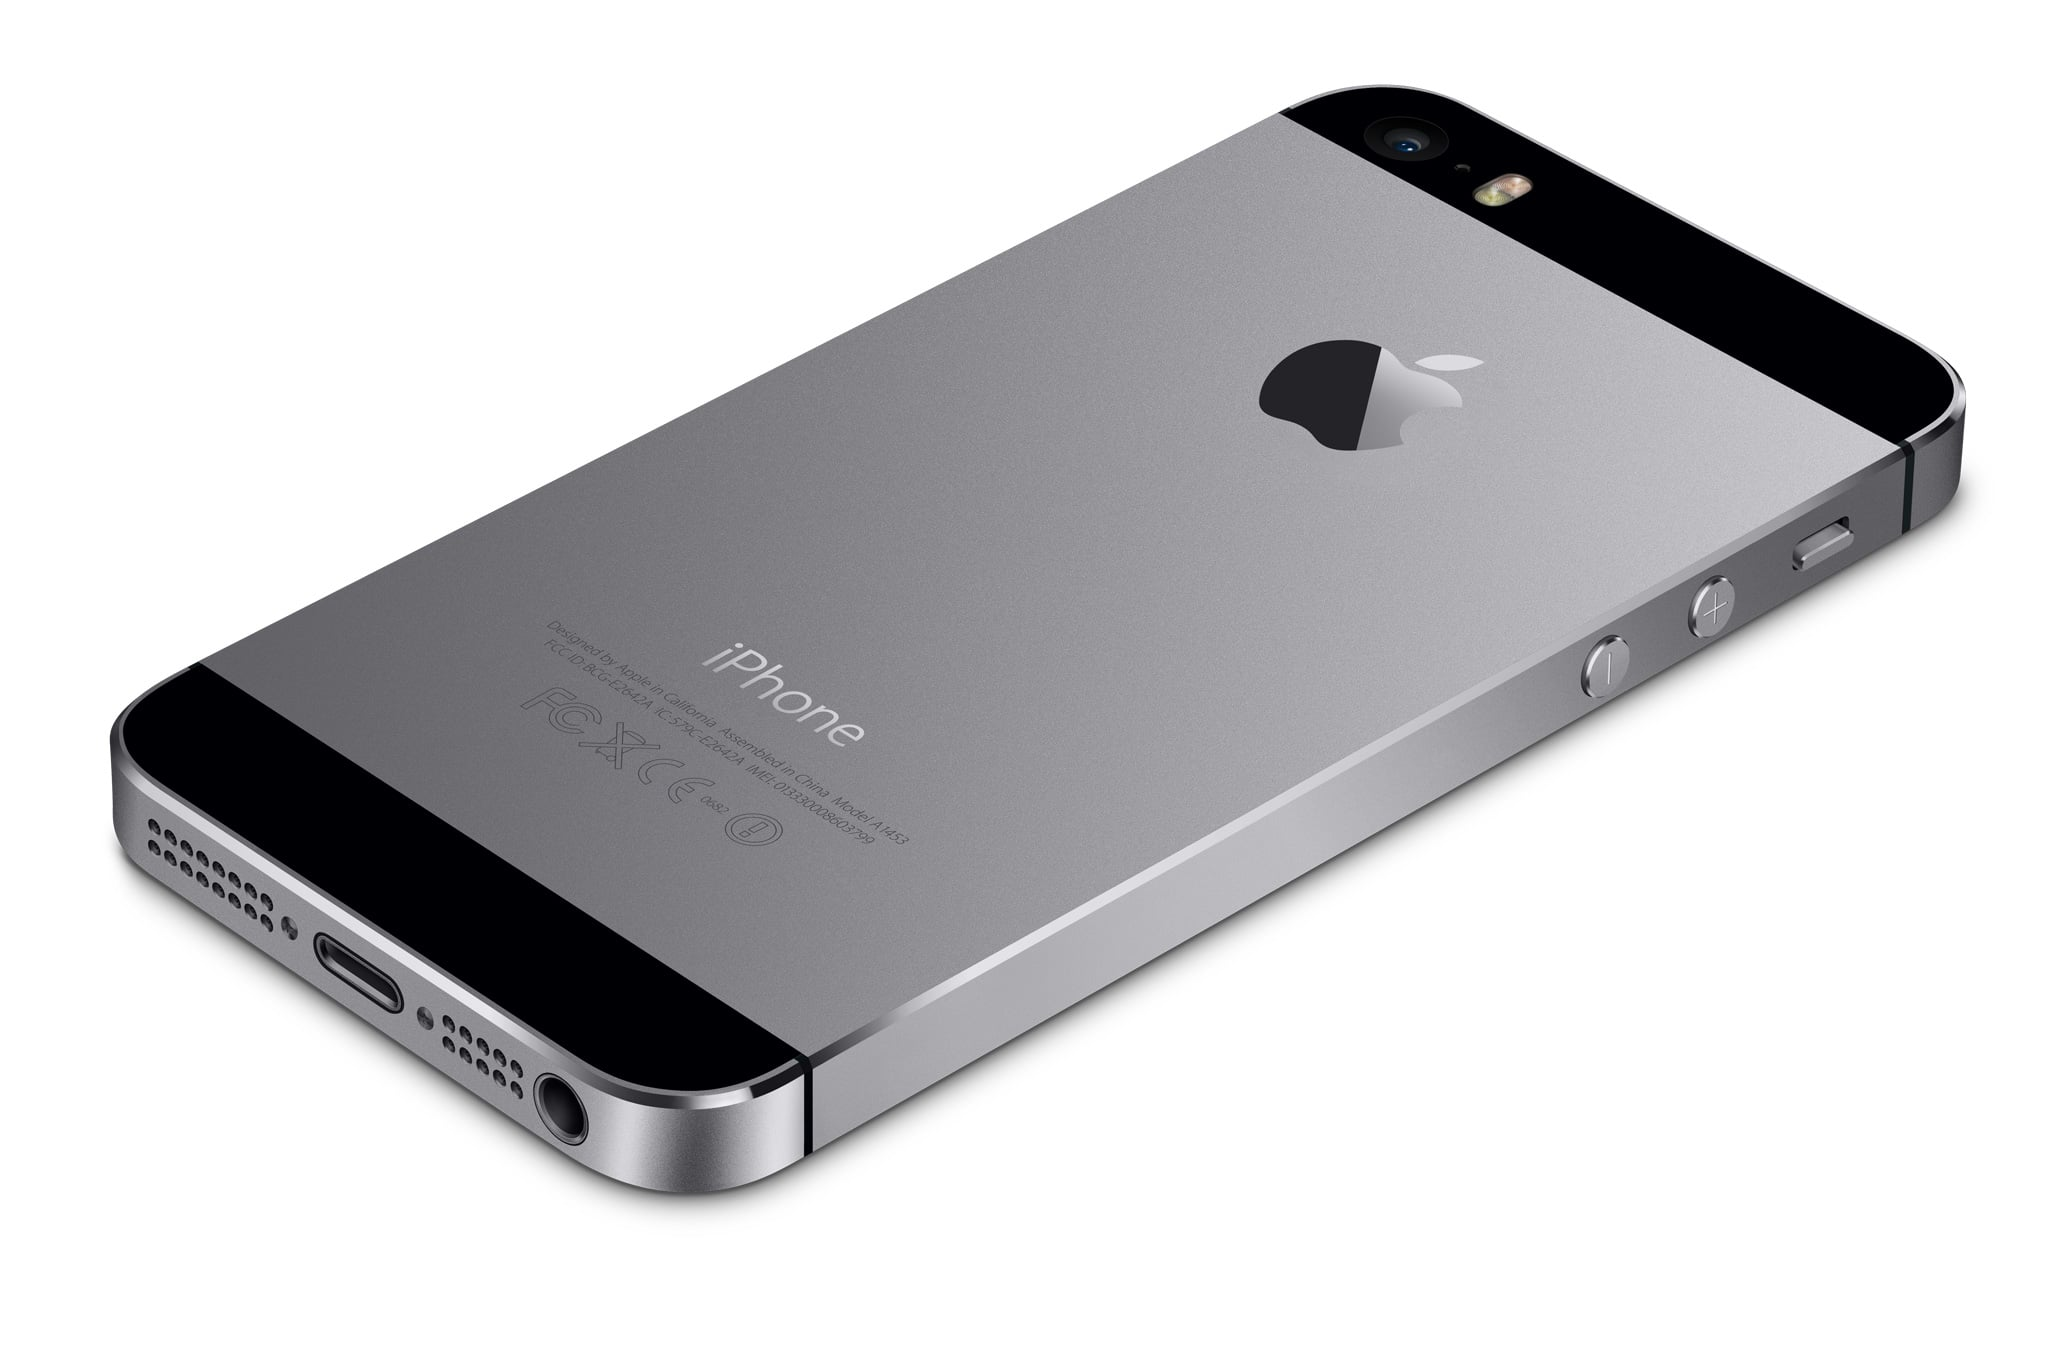 iphone 6 srebrny 16gb